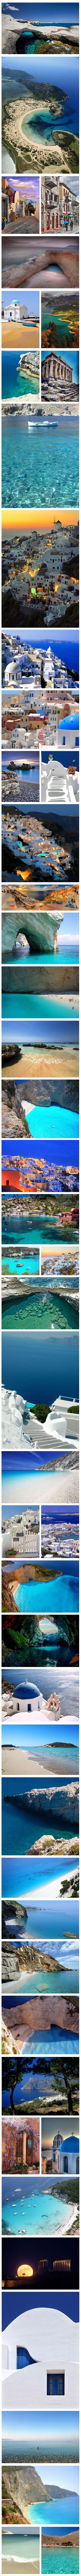 Greece!: